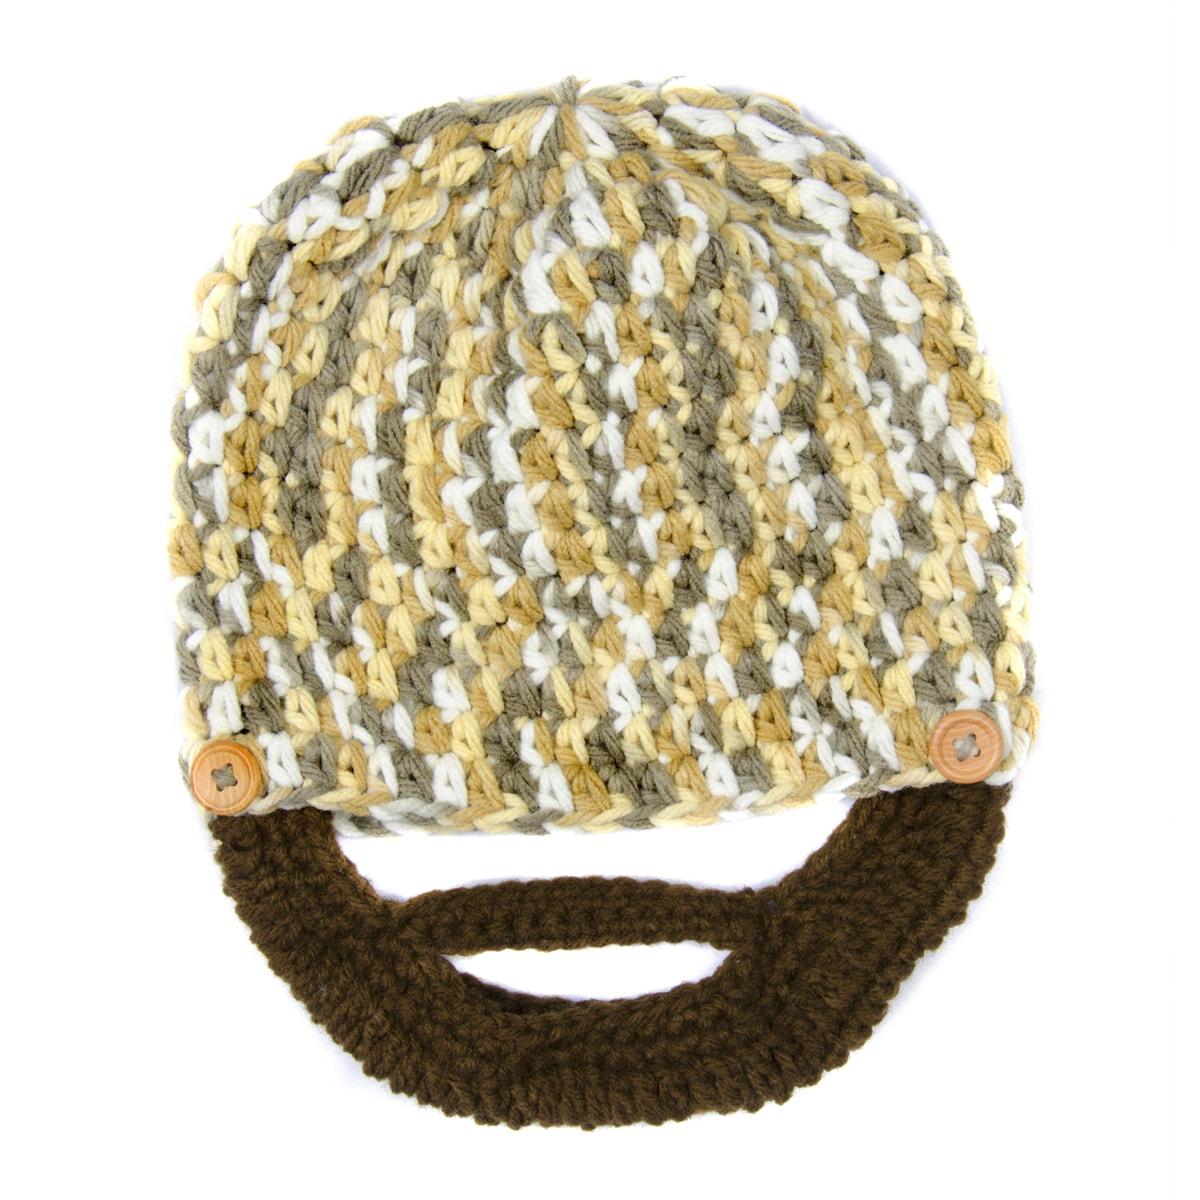 b1bbc3b2 Crummy Bunny Medium Lumberjack Beard Hat